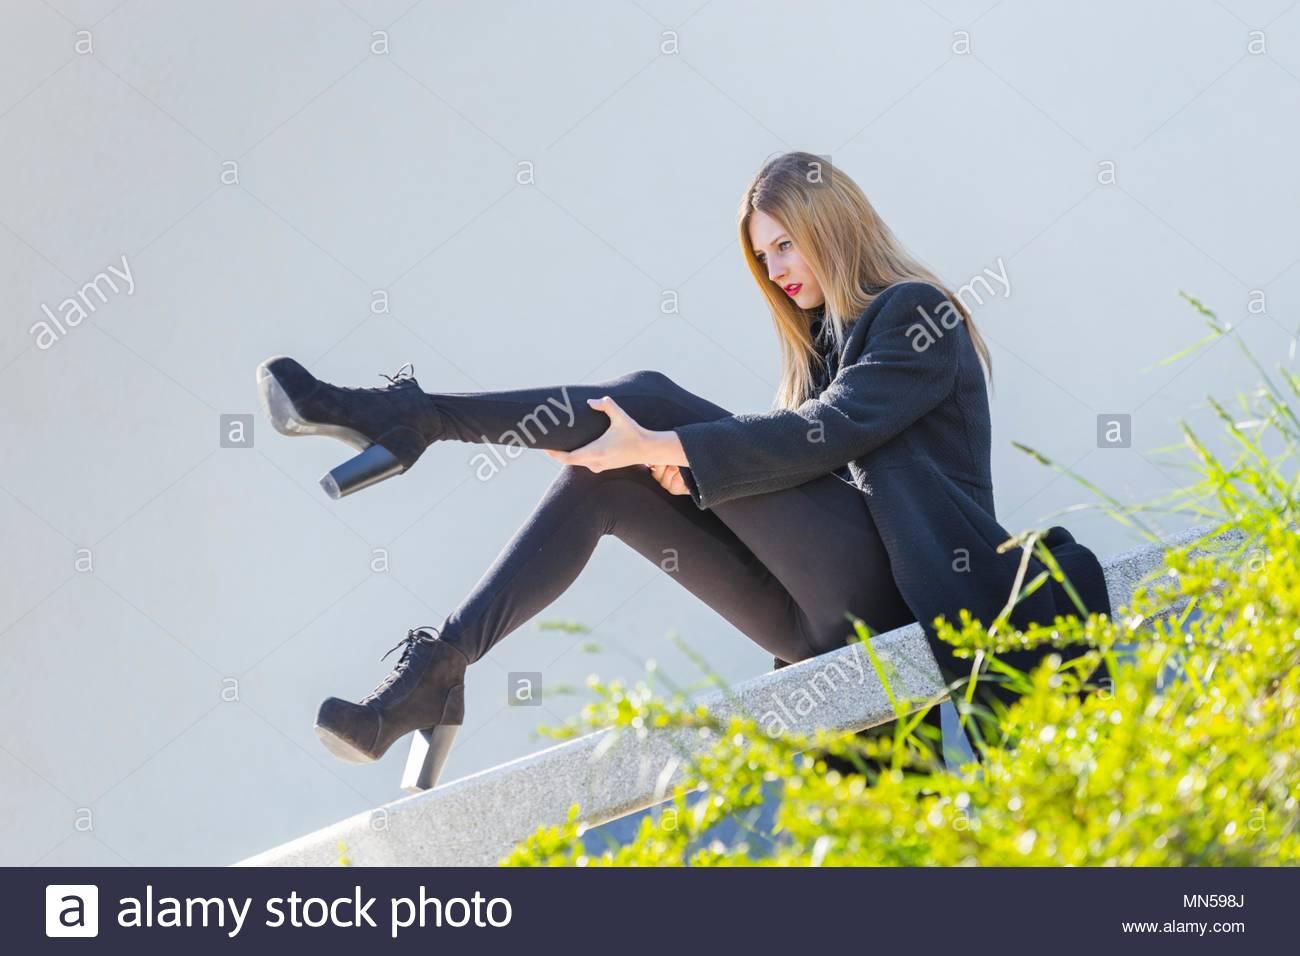 Teens wearing high heels